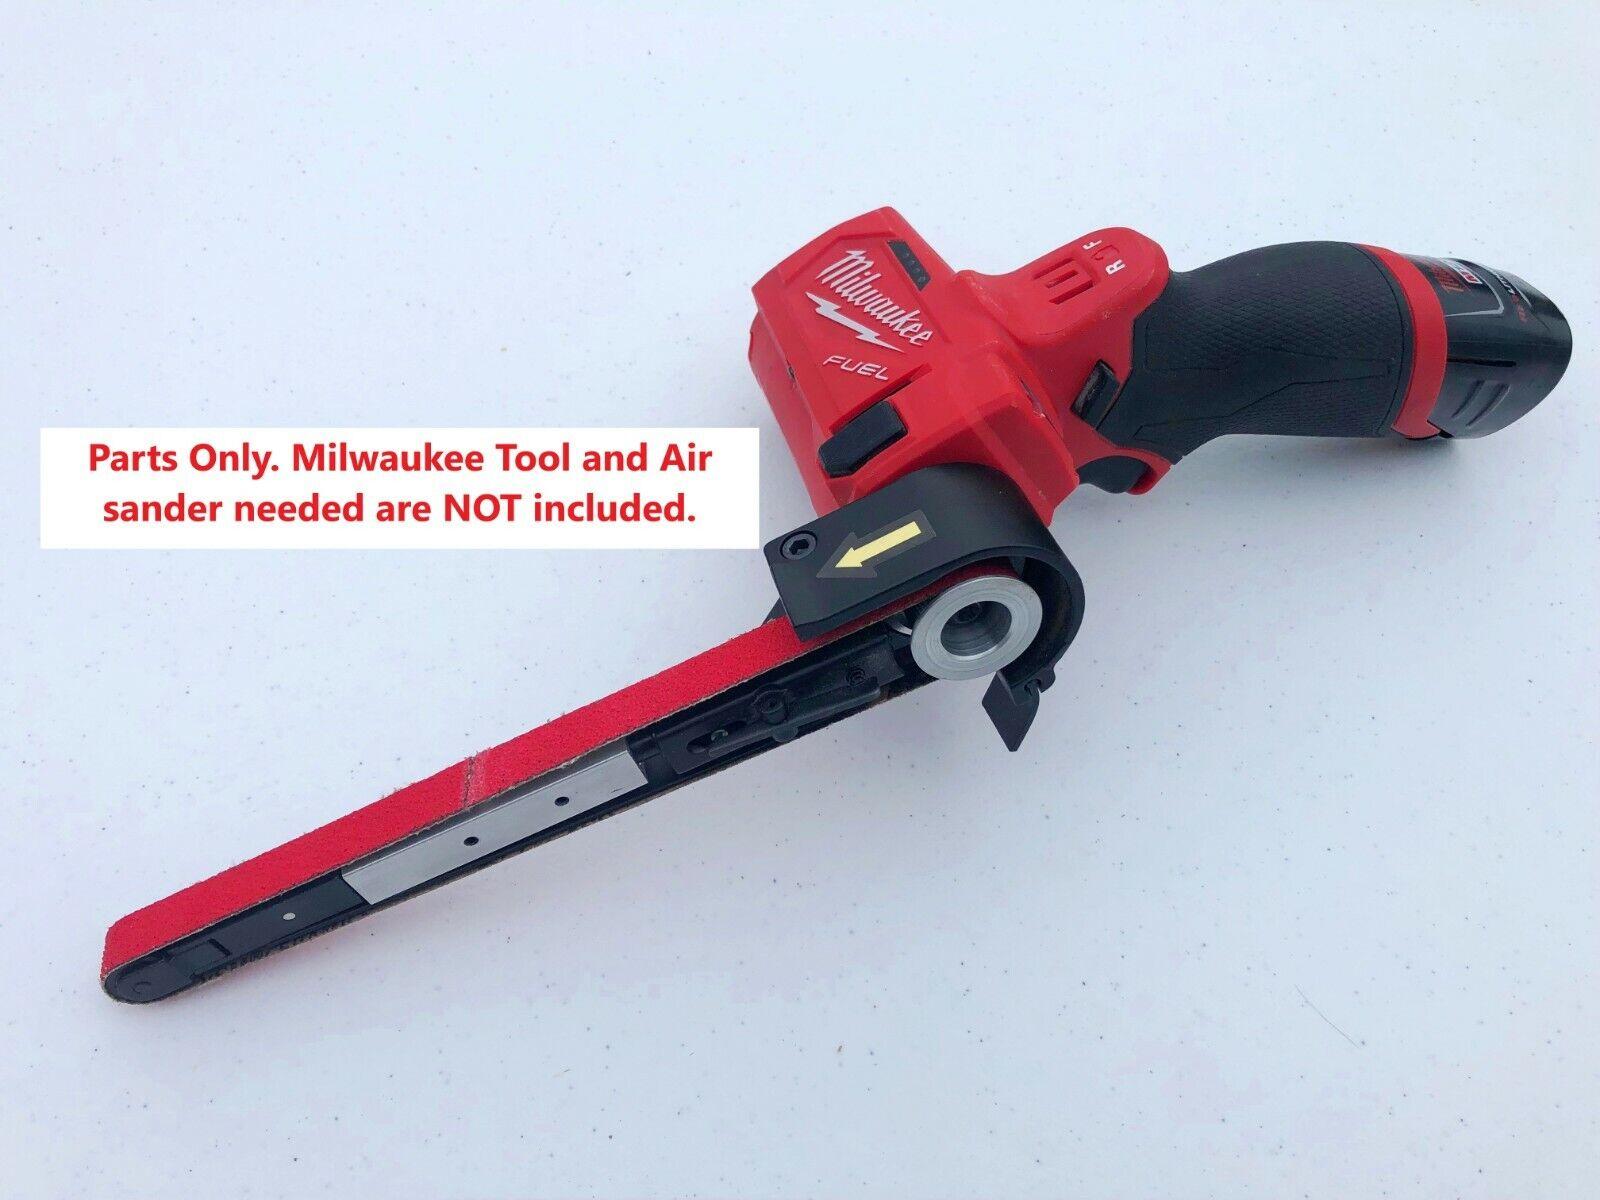 "Belt Sander CONVERSION PARTS, 1/2"", Milwaukee M12 Cut Off Sa"